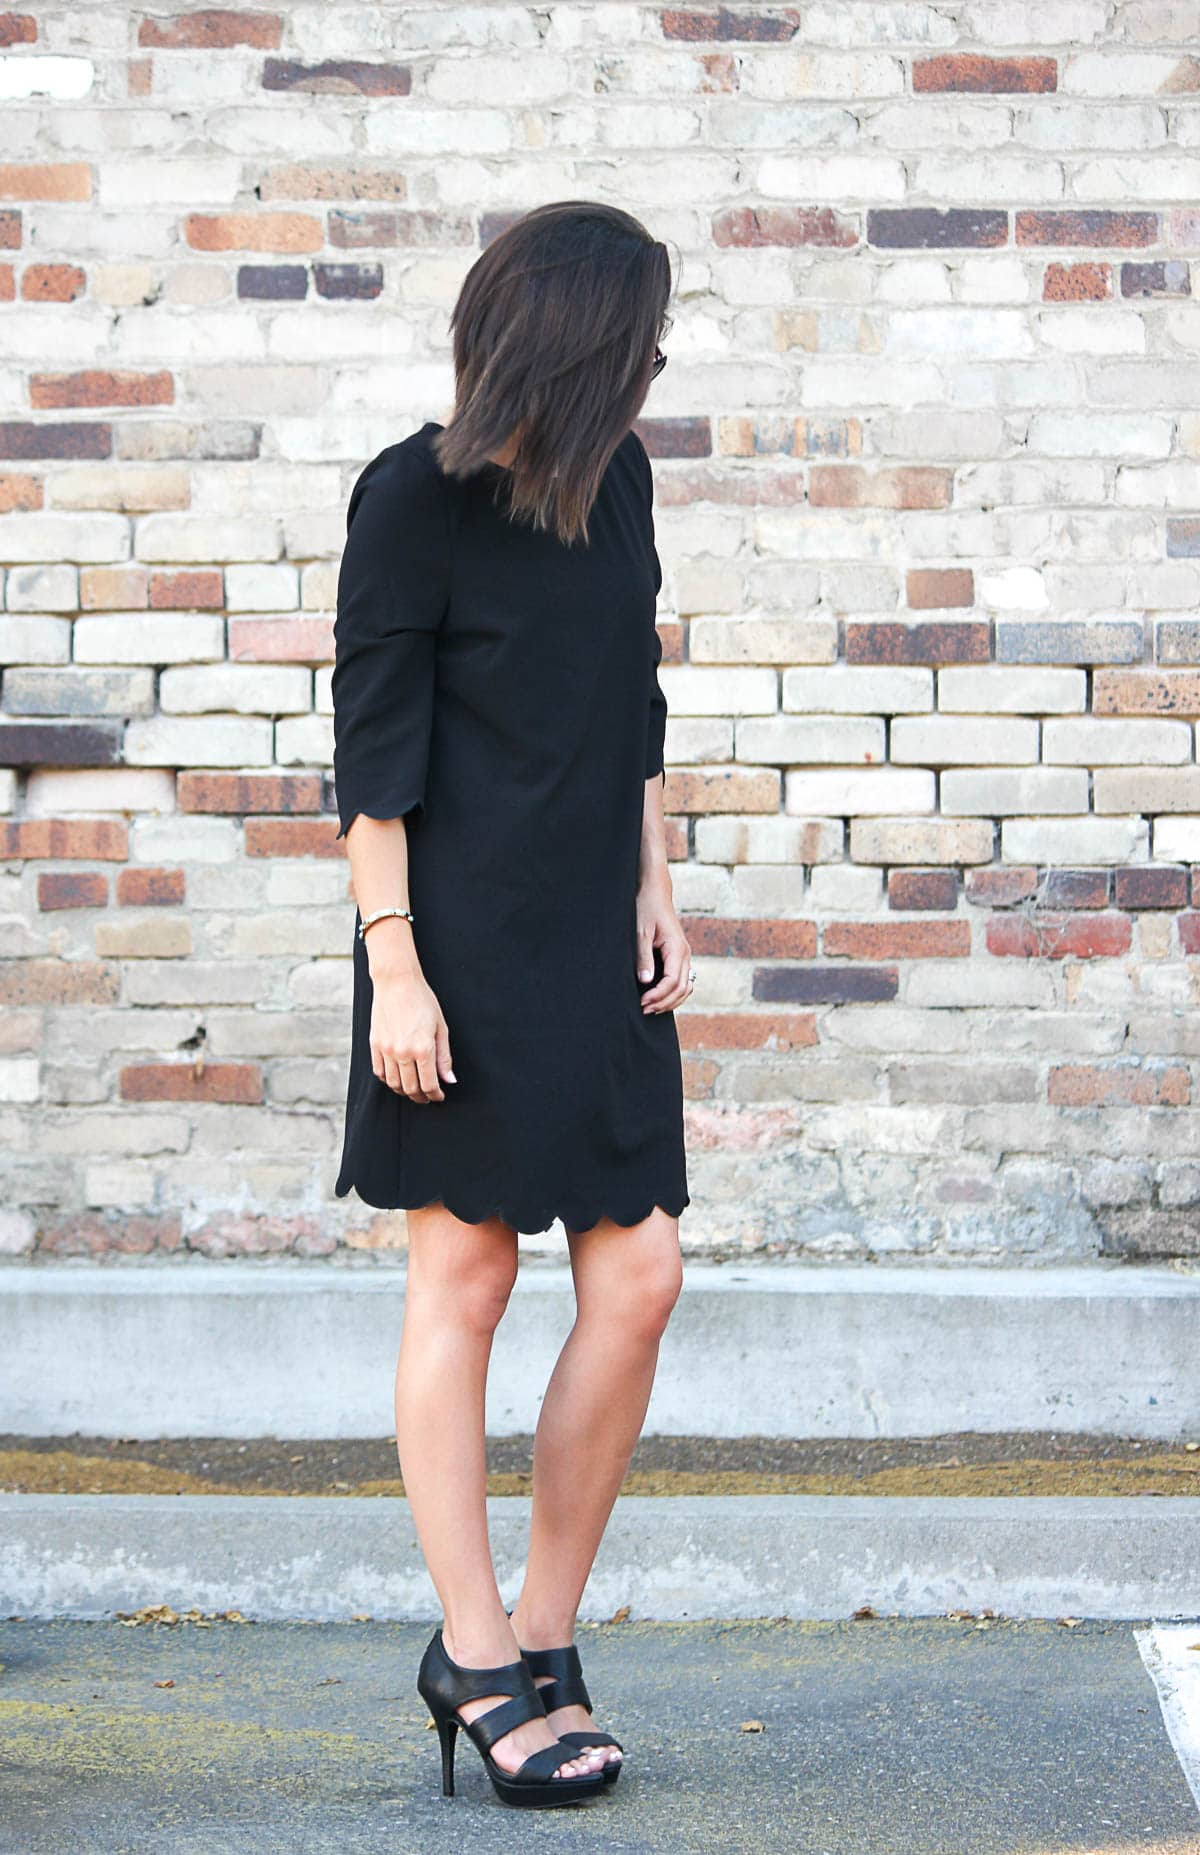 LBD with Heels - Classic Look - TObi.com